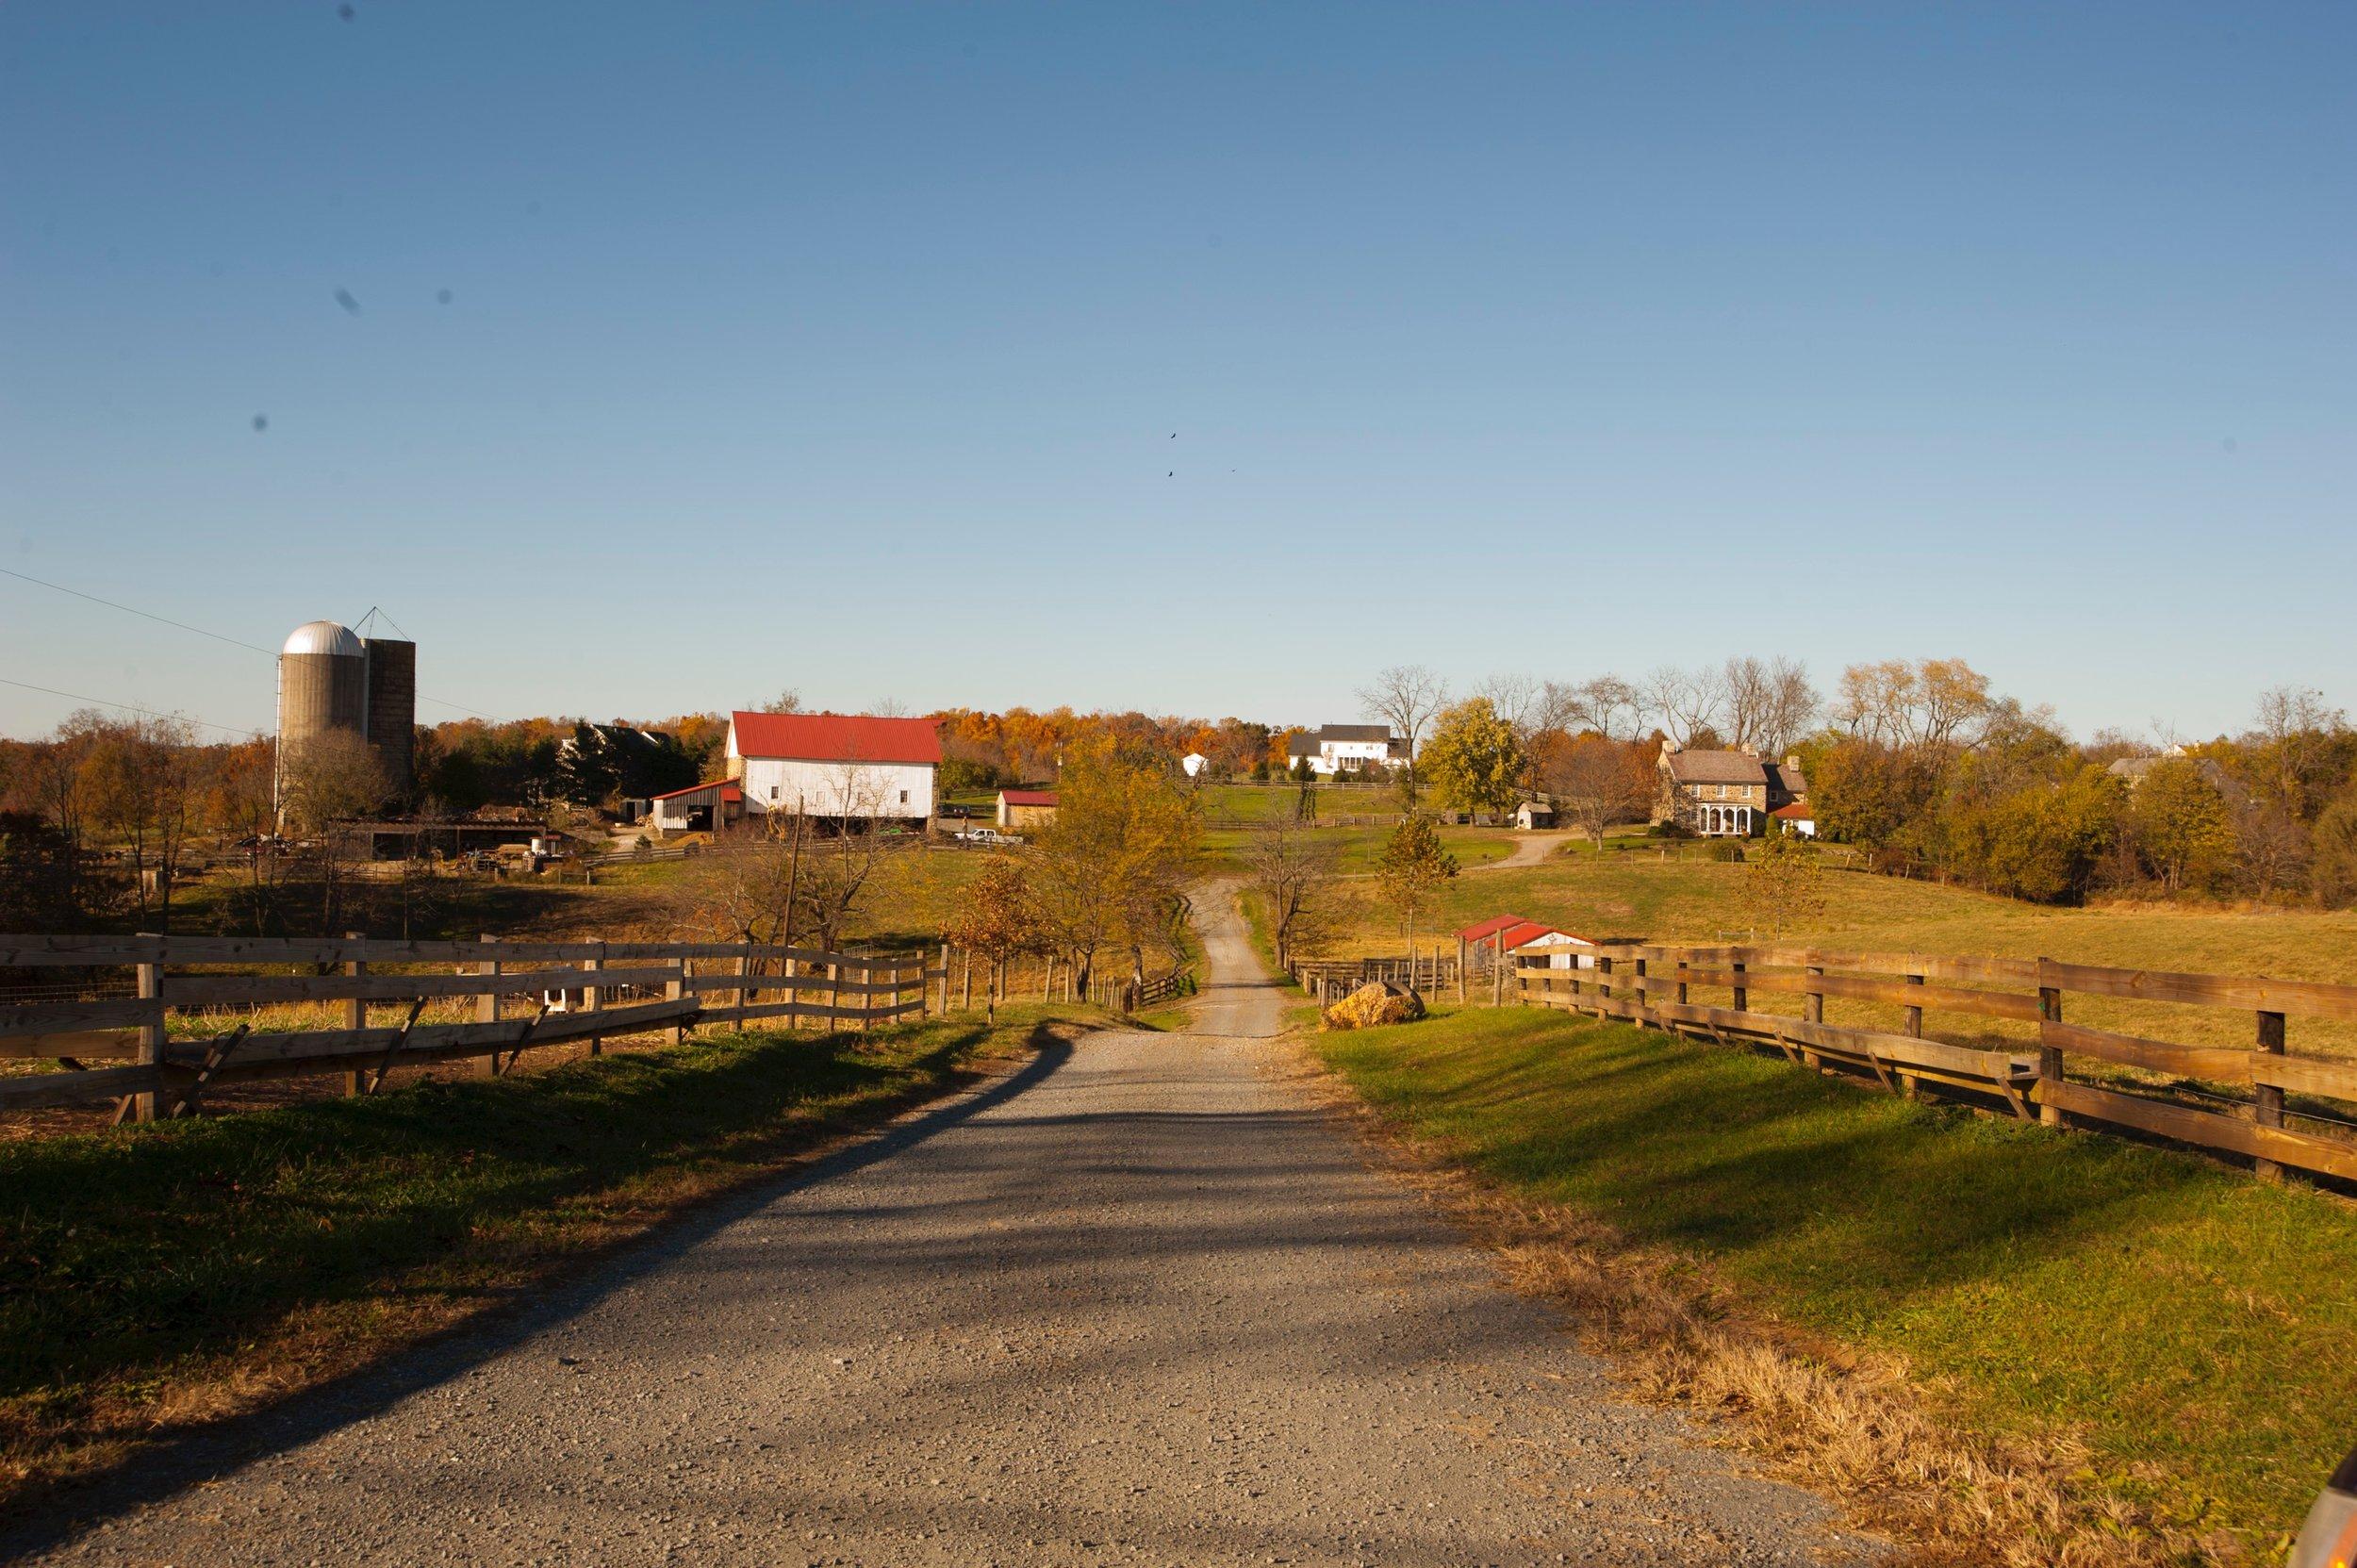 The Cochran's farm, where a flock of sheep often grazes the front fields.